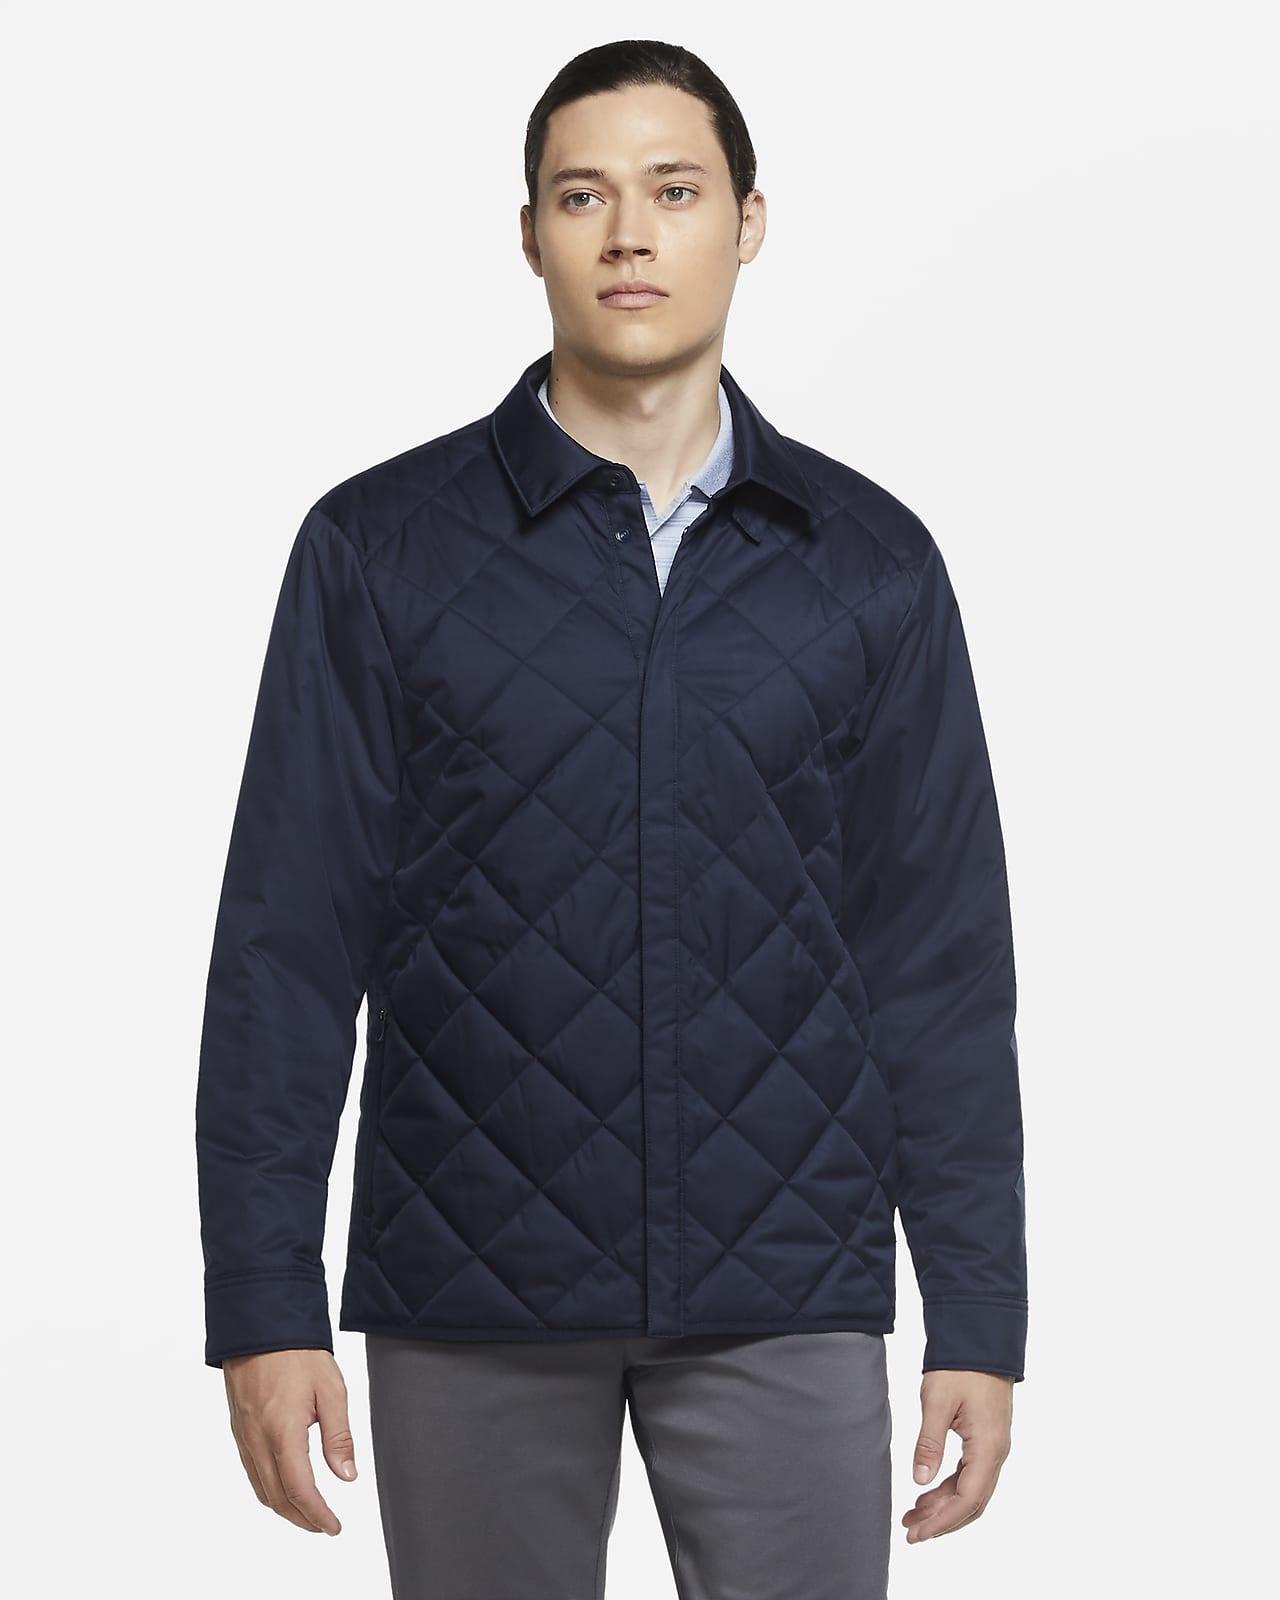 Nike Repel Men's Synthetic-Fill Golf Jacket